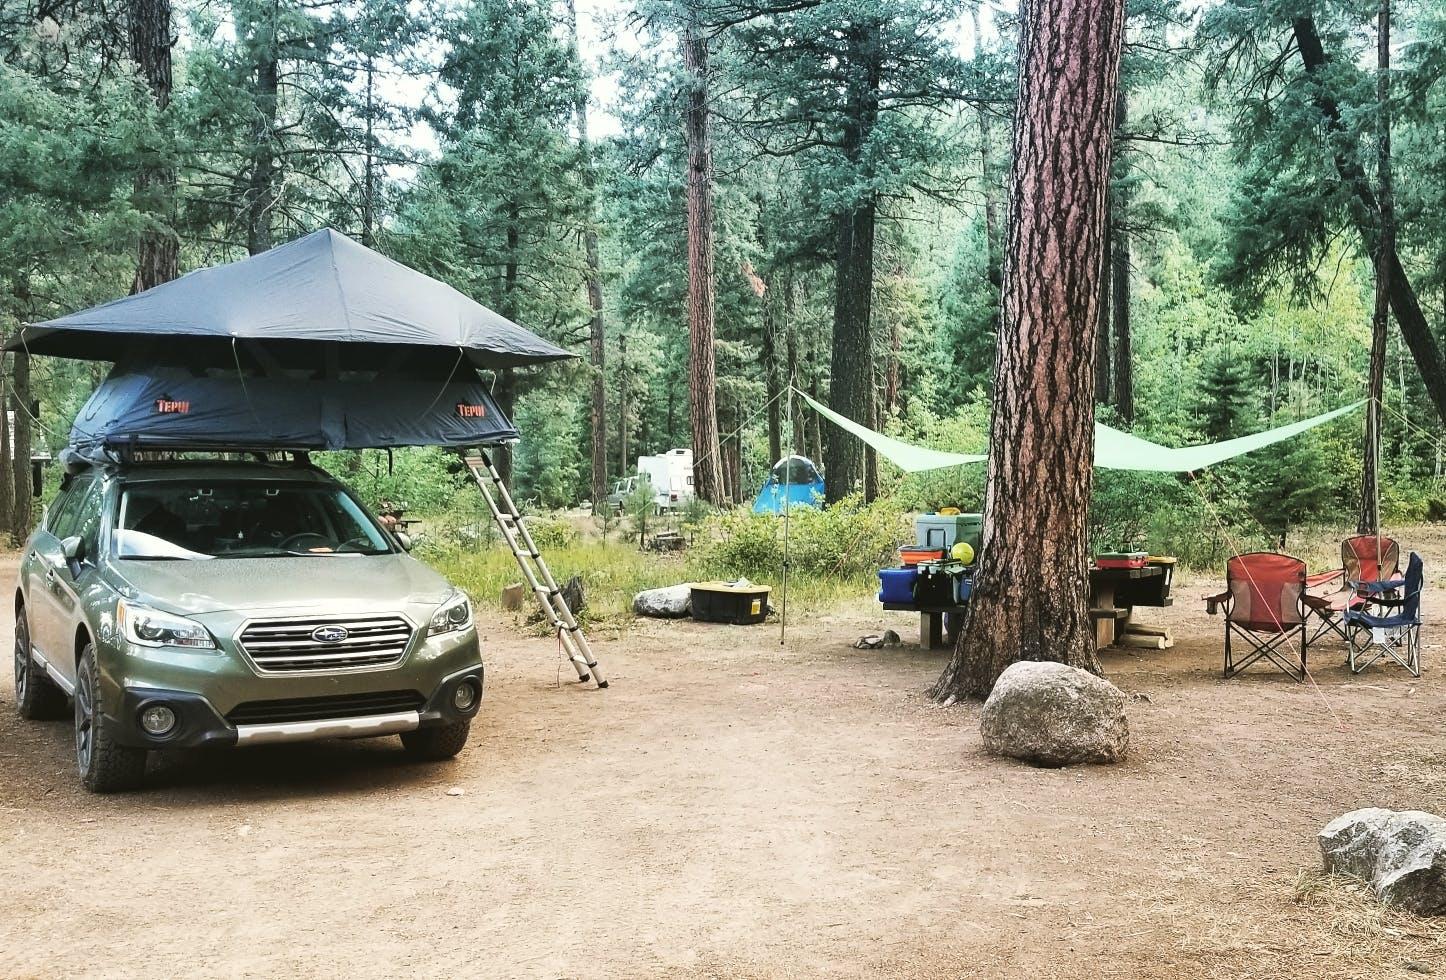 aspen groves at vallecito campground